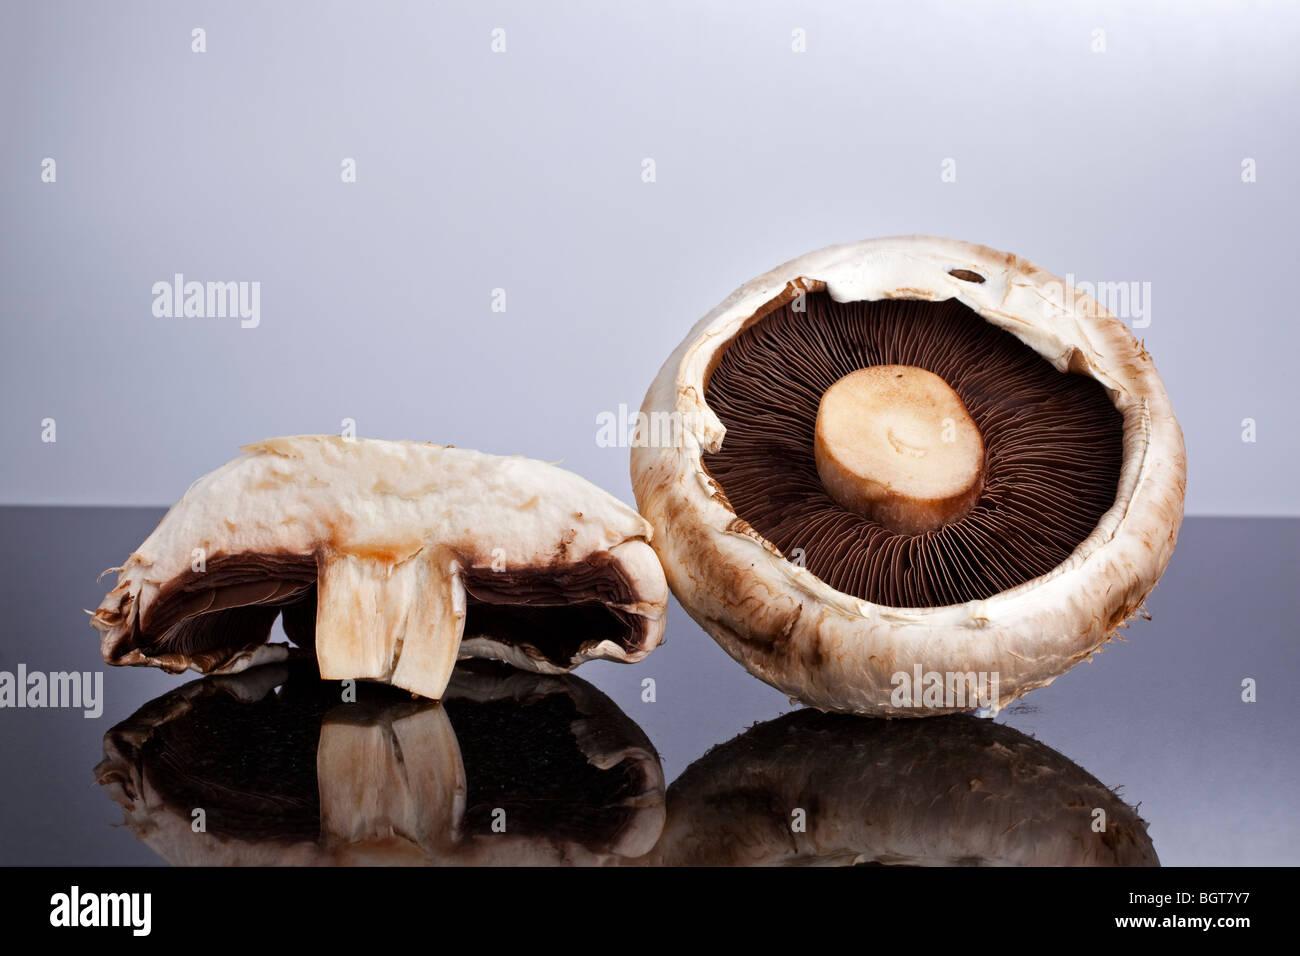 A whole and a sliced mushroom - Stock Image